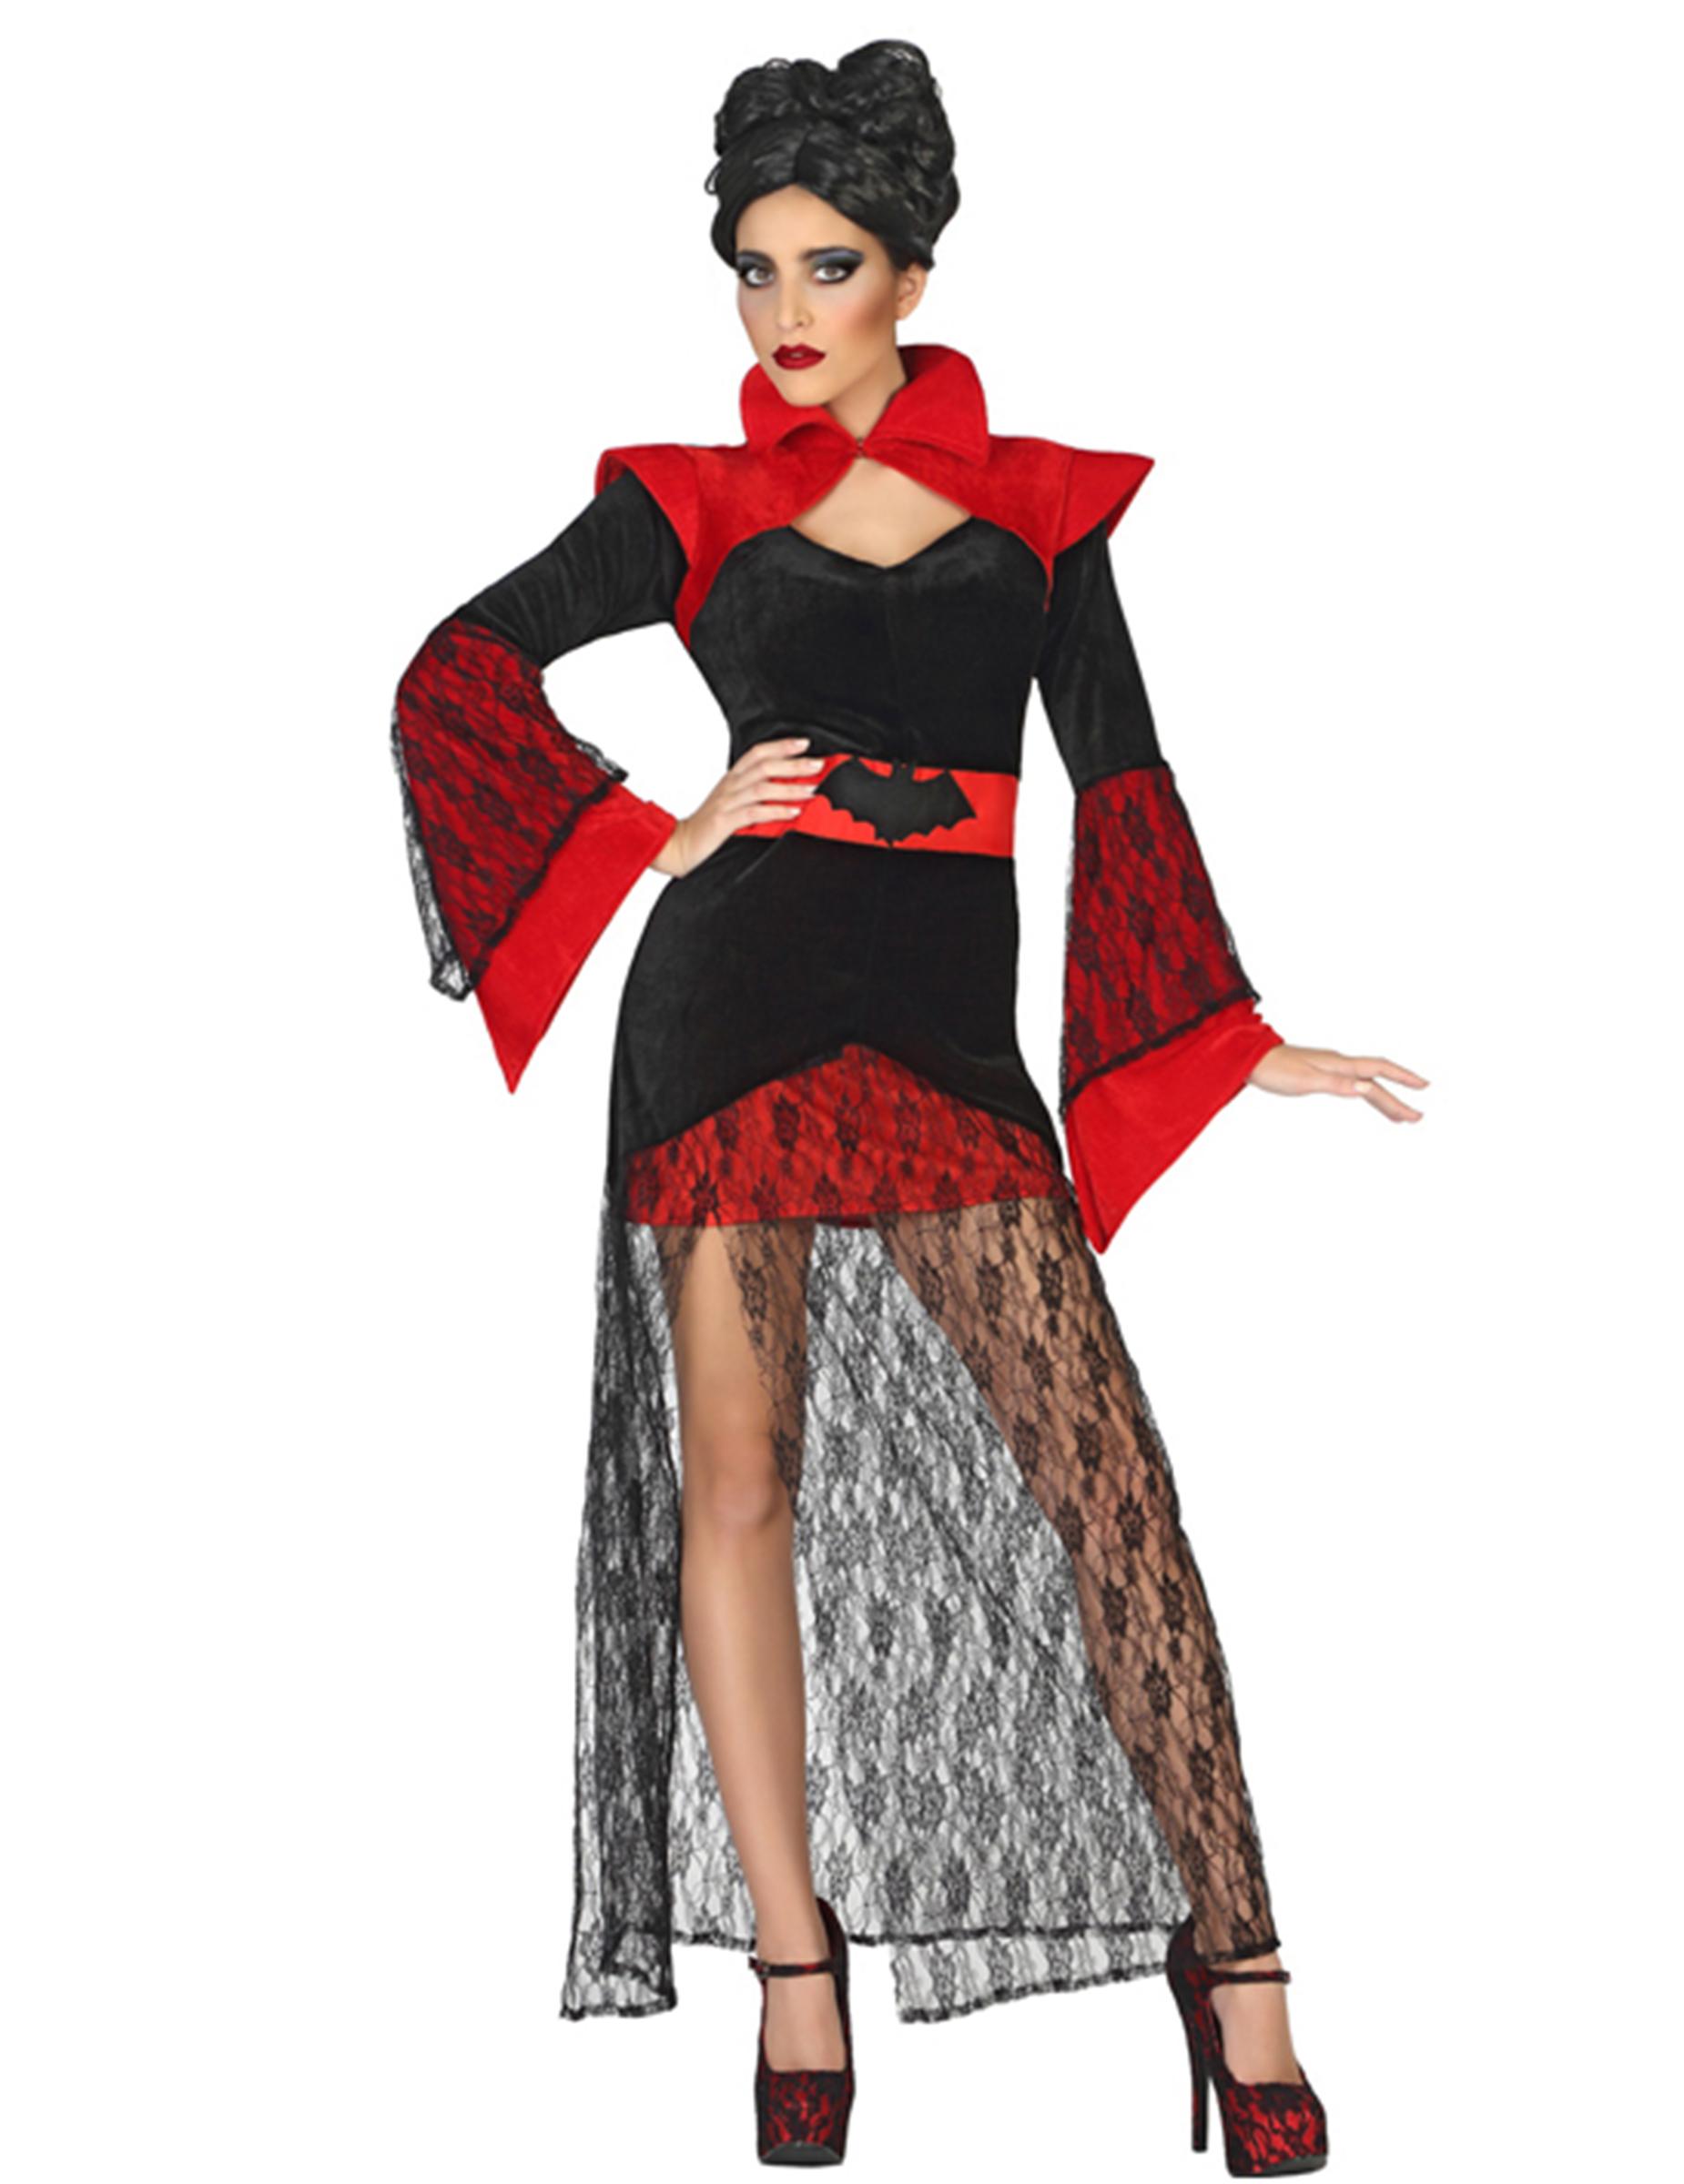 Trajes de duendes para nios elegant disfraces para nios - Halloween hipercor ...